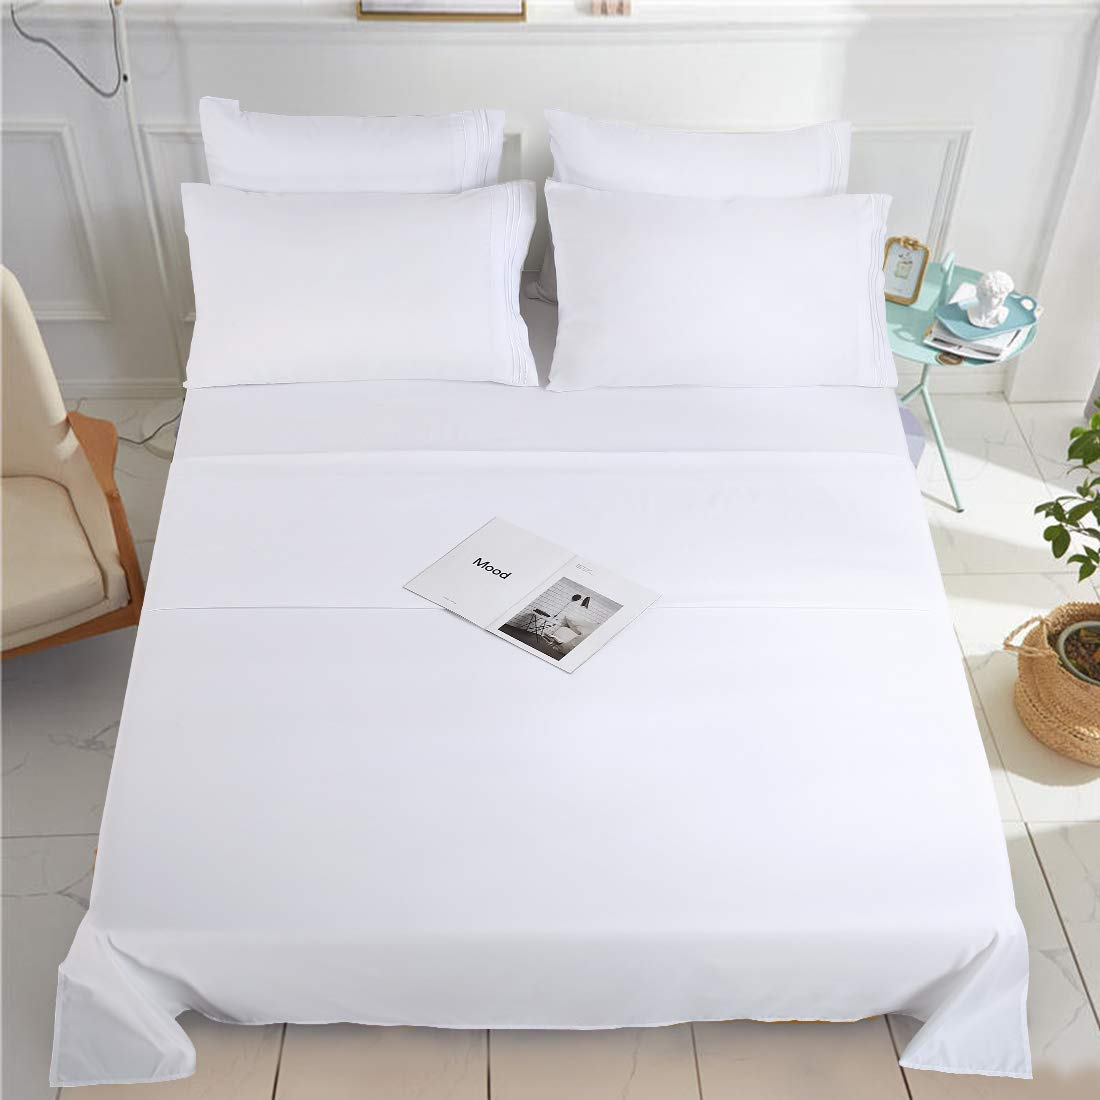 KARRISM Full Size 6 Piece Bed Sheets Set Extra Soft & Breathable Brushed 1800 Series Microfiber, Wrinkle & Fade Resistant, Comfortable Deep Pocket Bedding Set, White